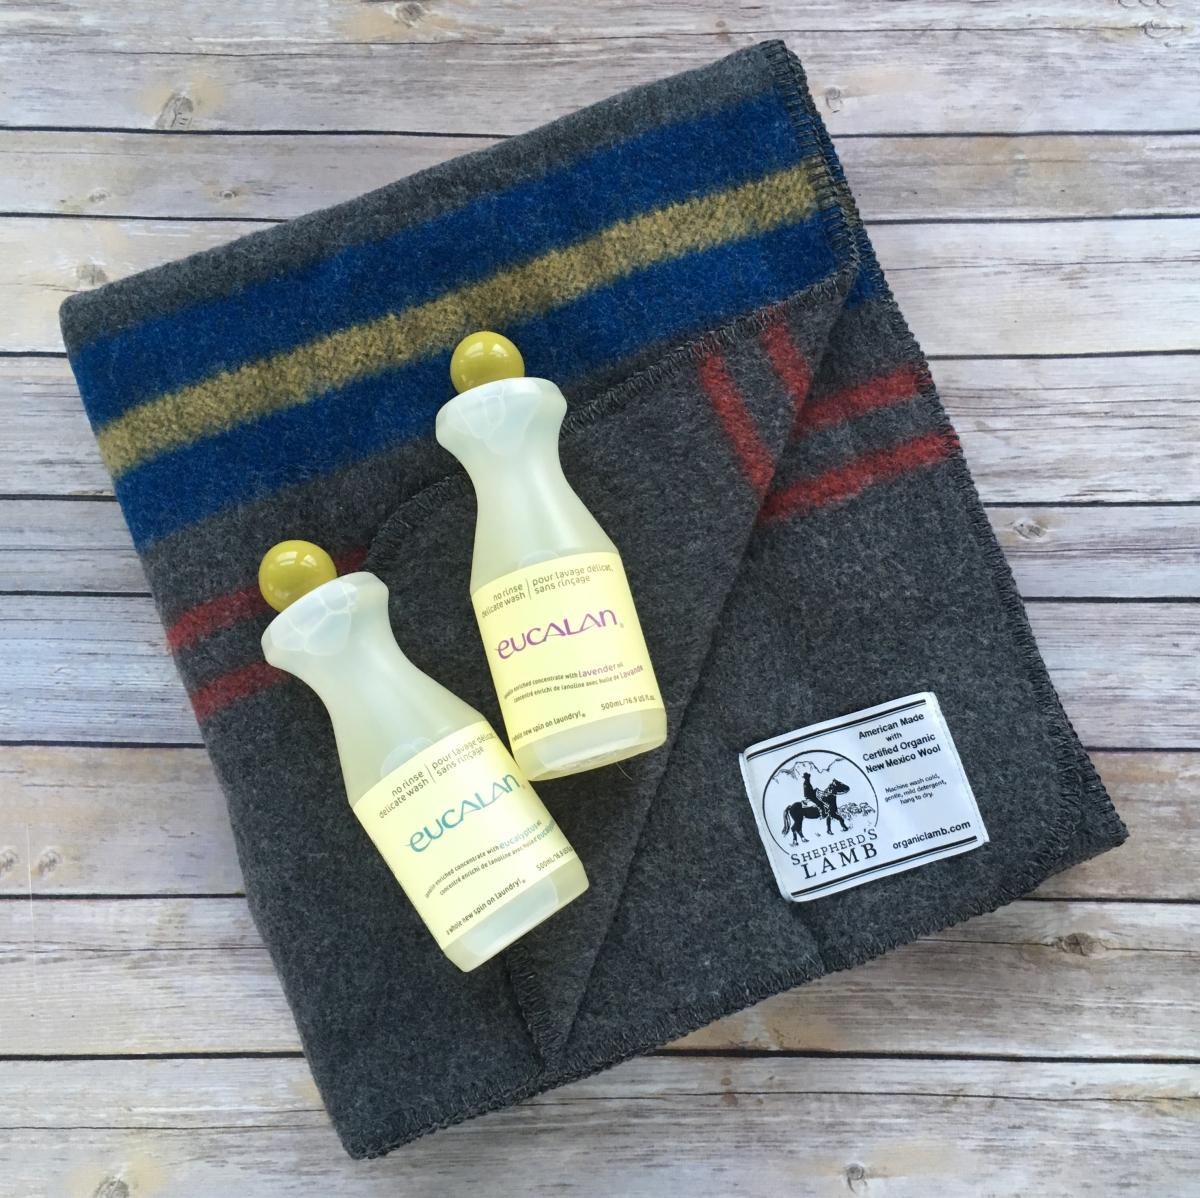 how to wash a wool blanket eucalan delicate wash. Black Bedroom Furniture Sets. Home Design Ideas